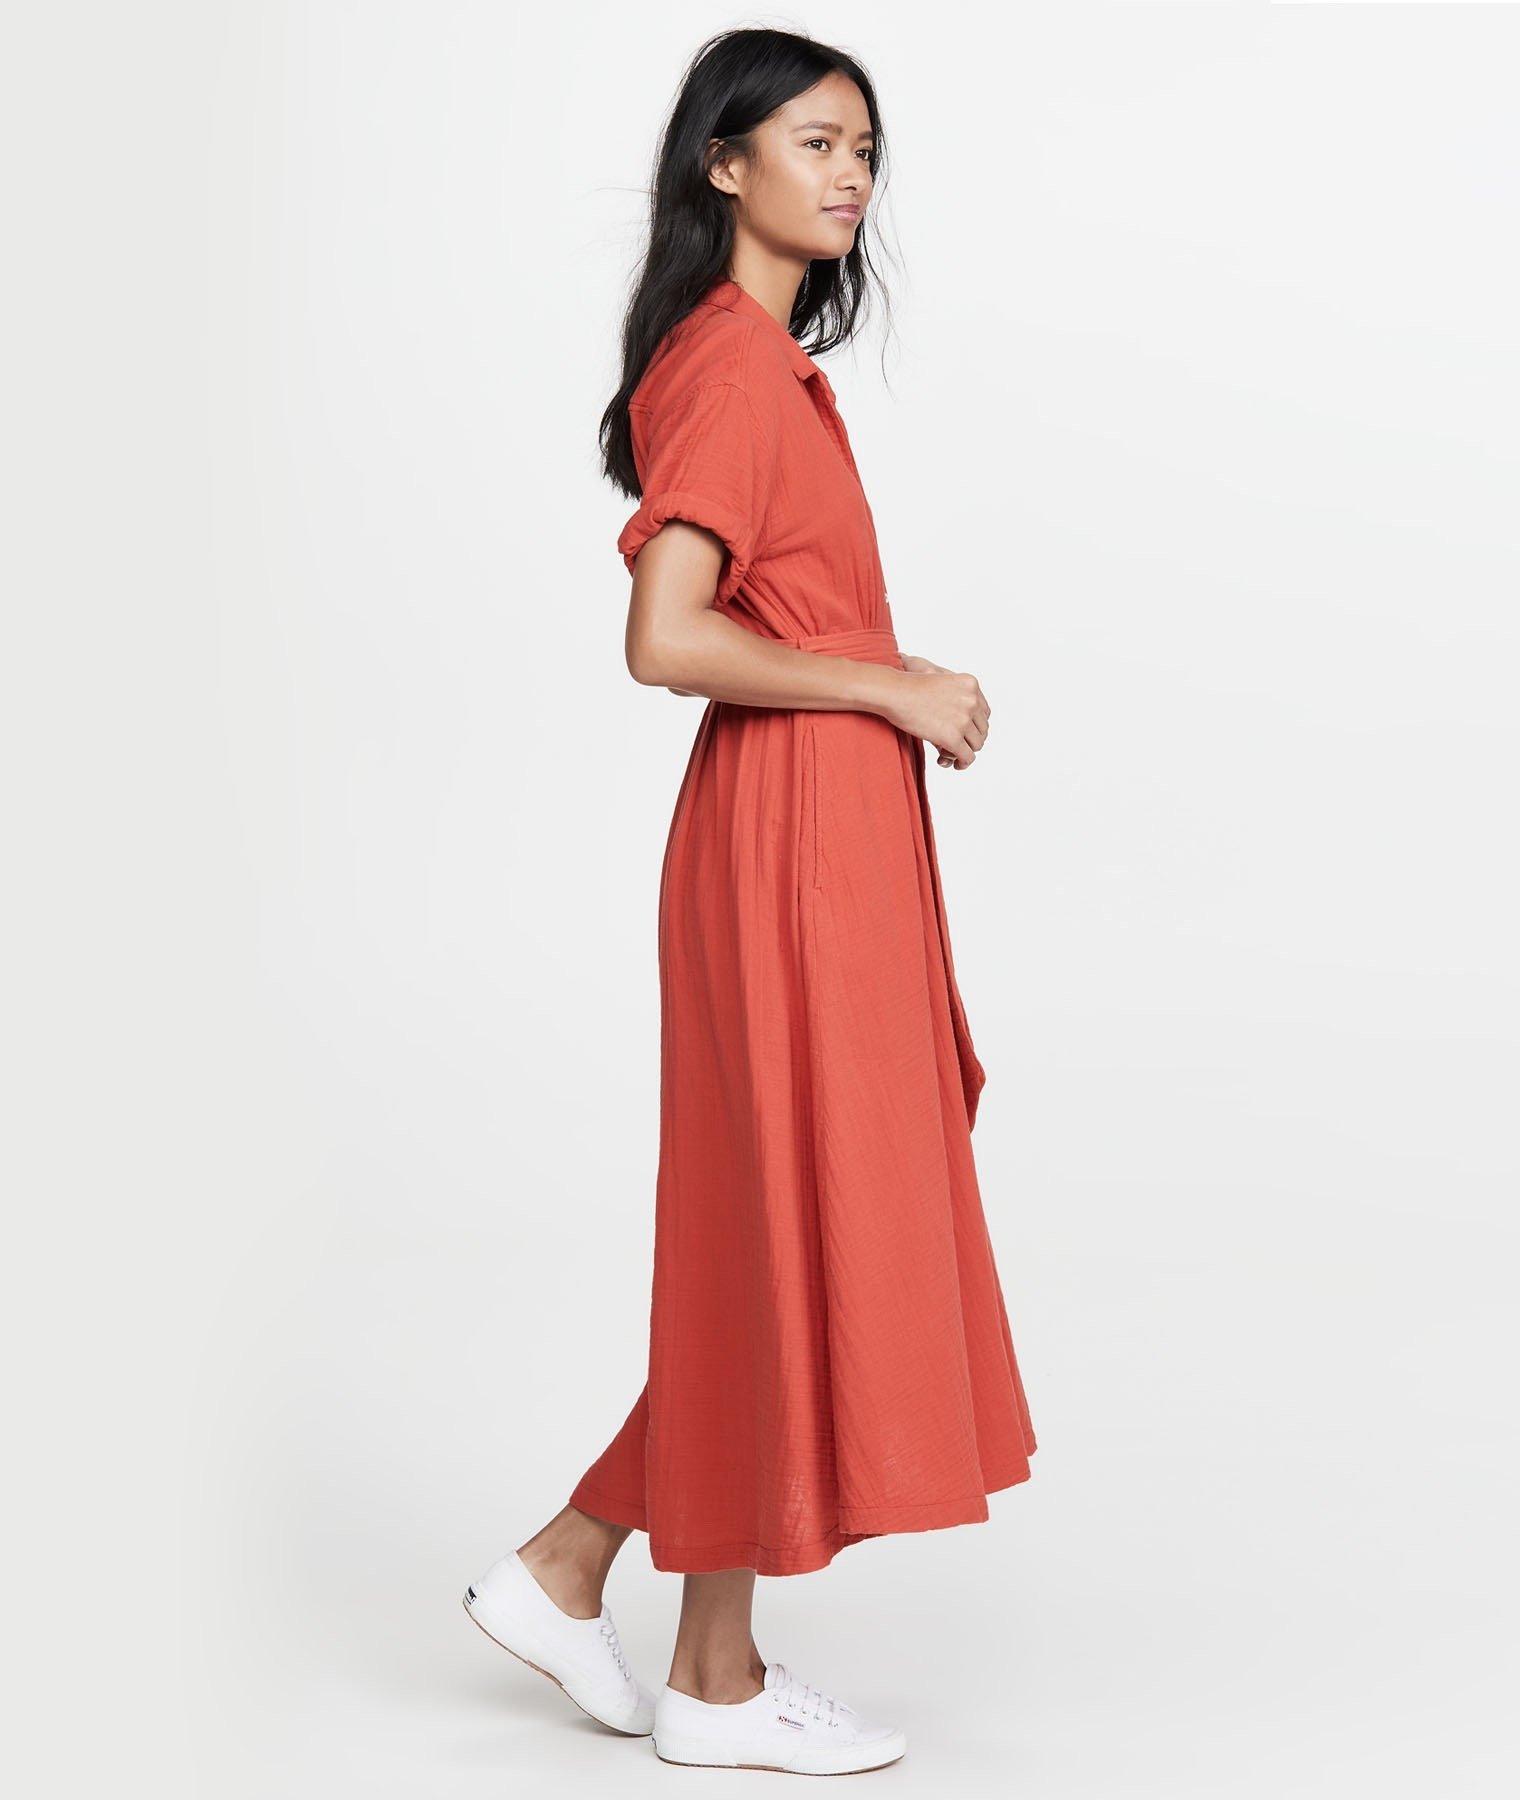 Xirena red dress